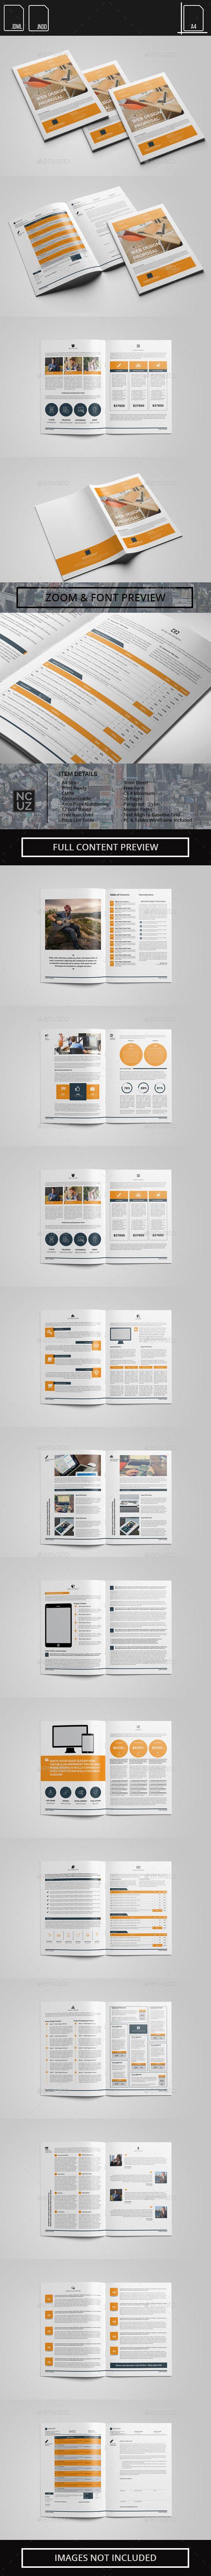 proposal web design and web development template design download httpgraphicriver